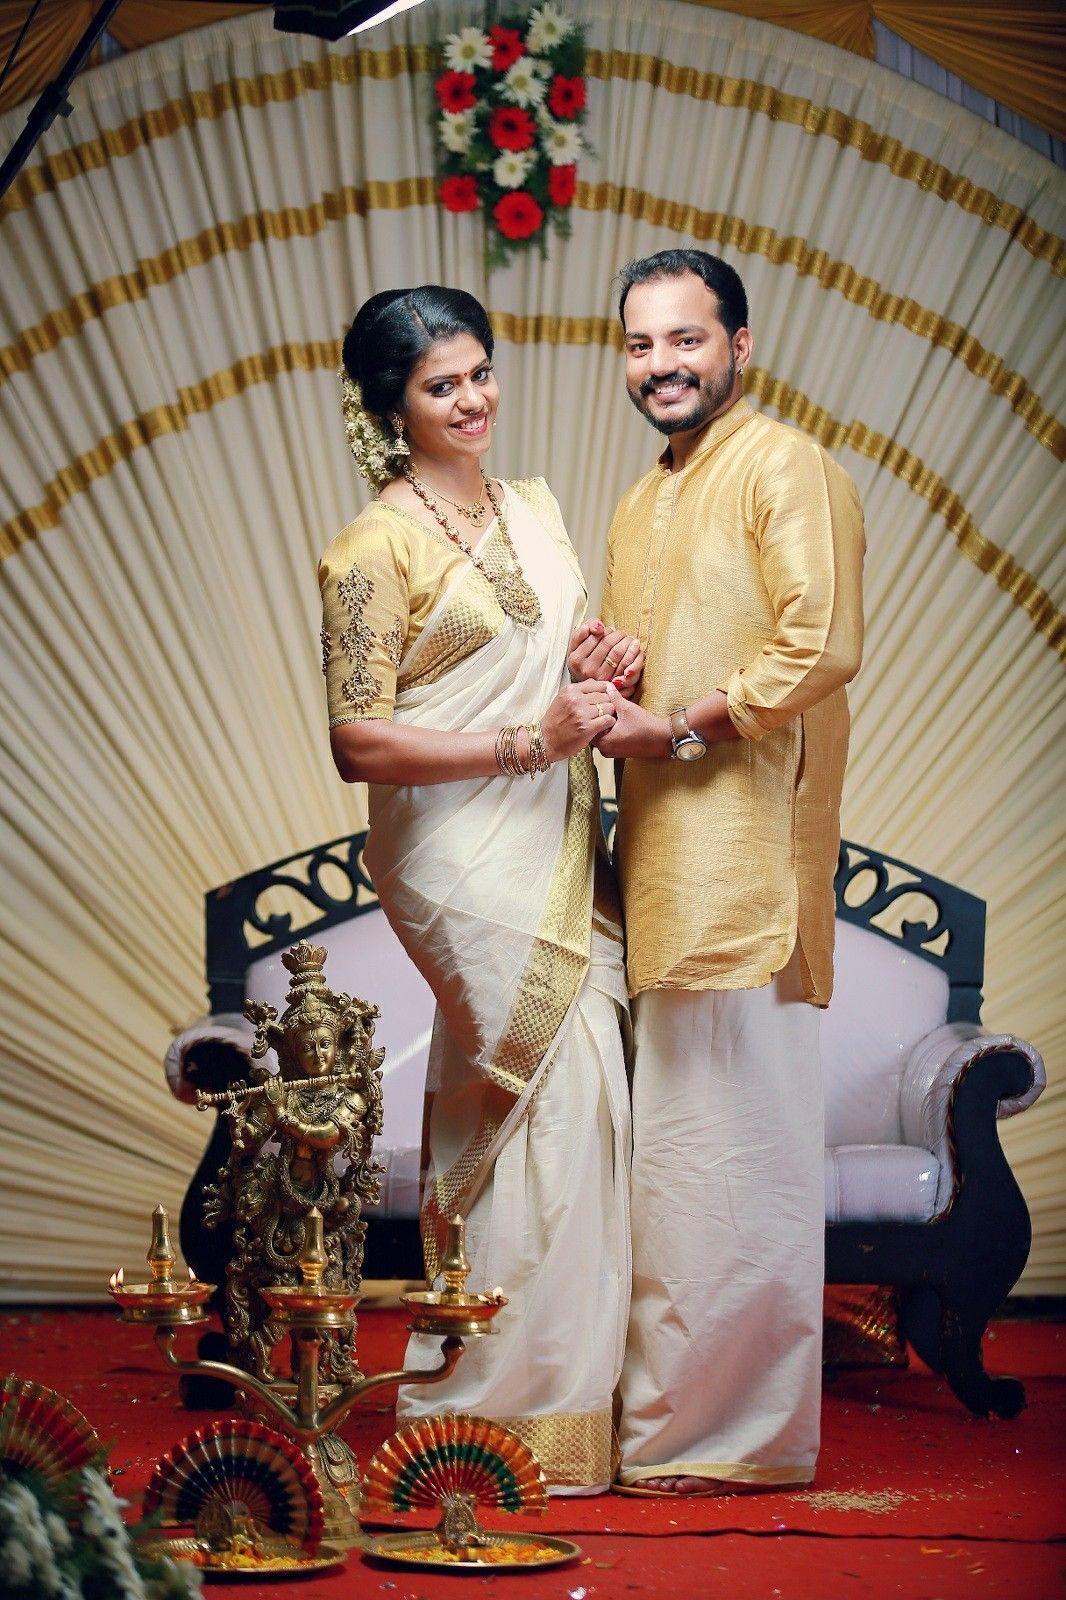 bijin aiswarya aiswarya bijin kerala engagement kerala bride rh pinterest com